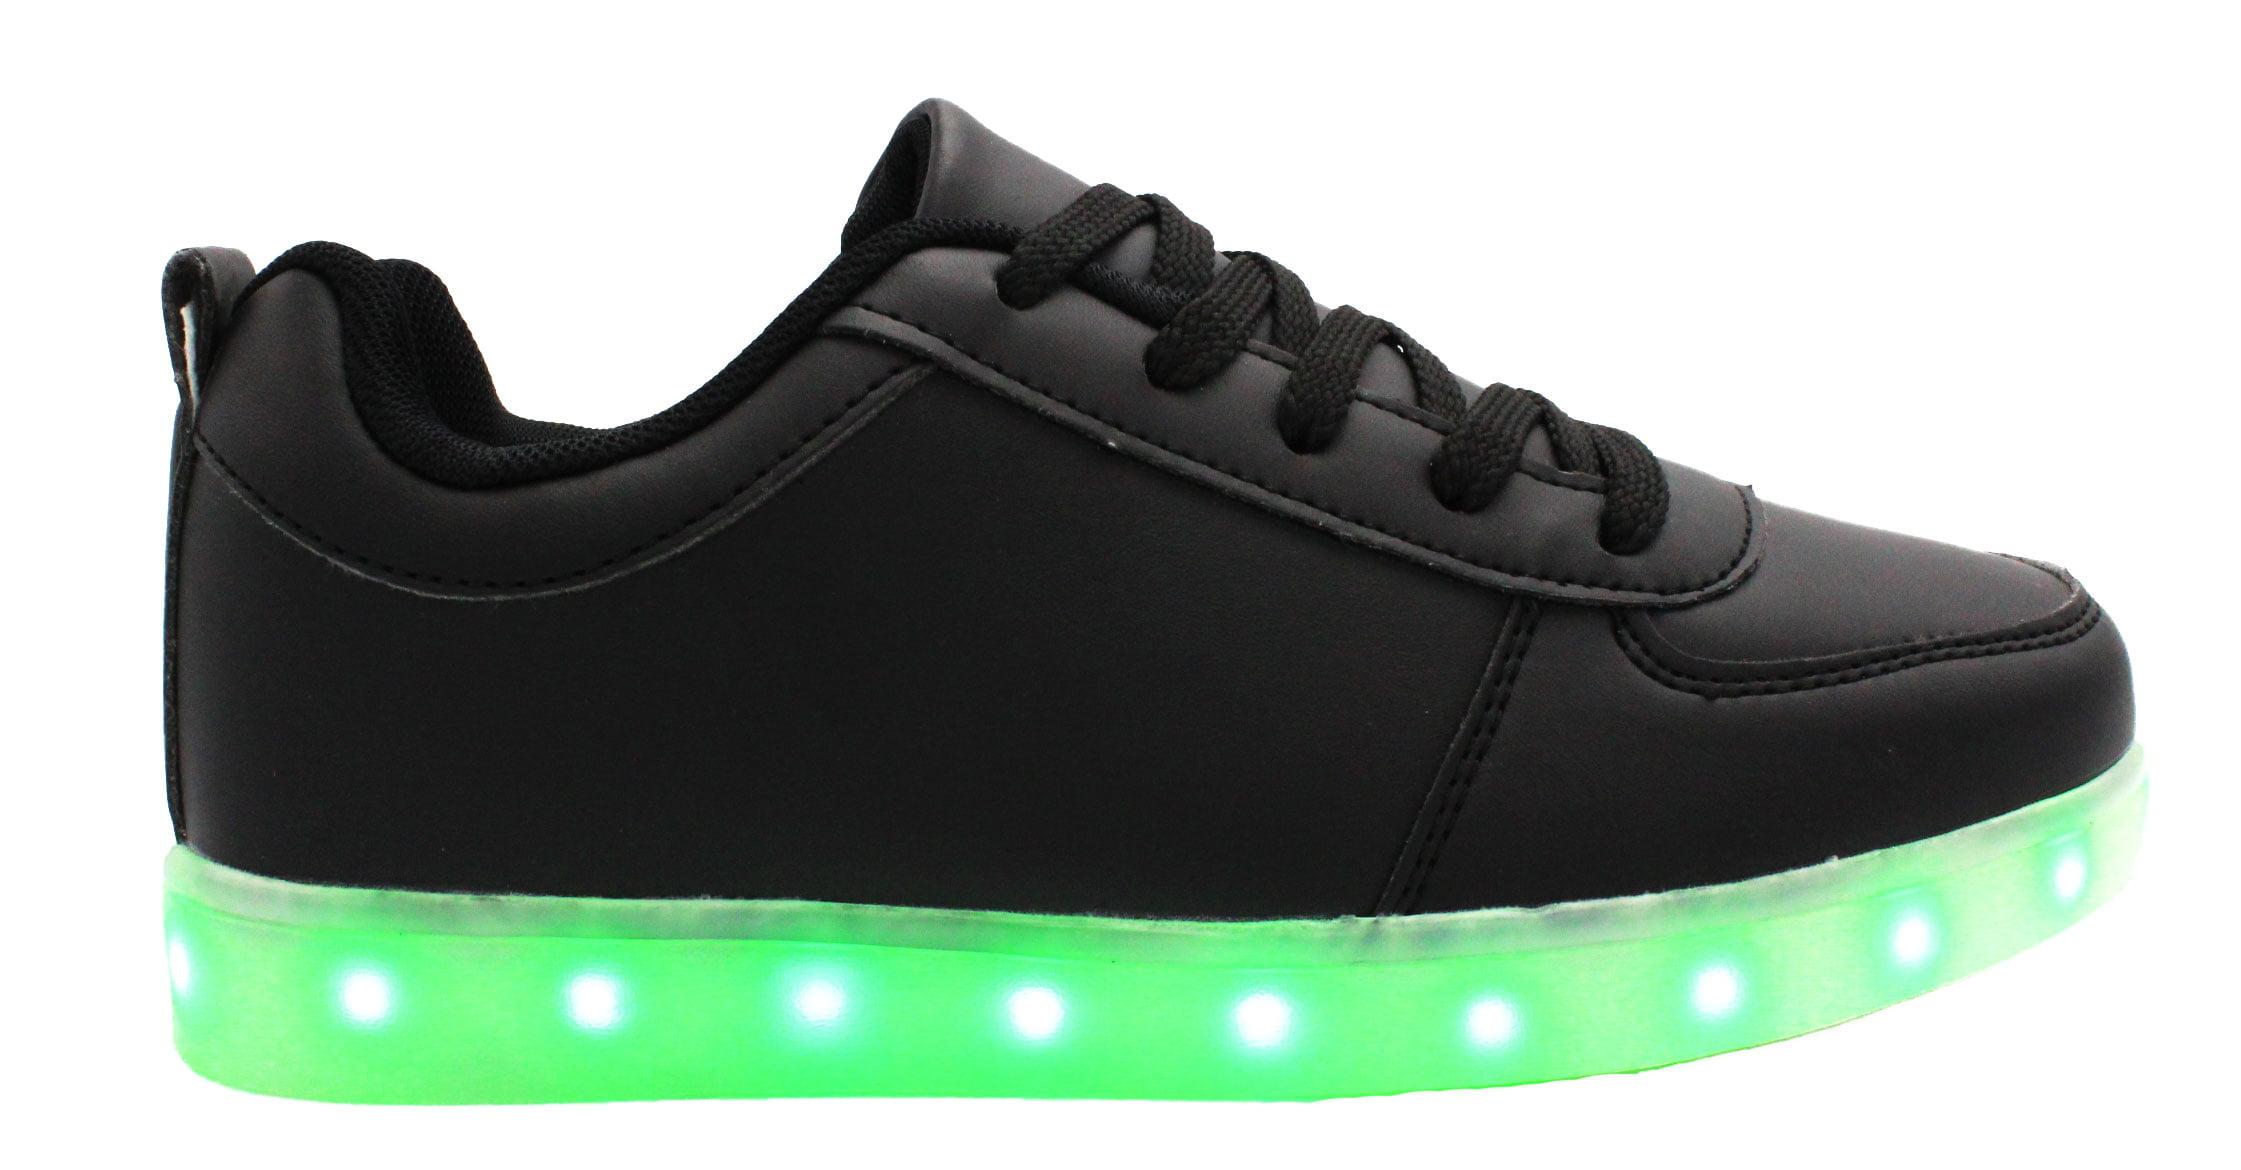 walmart led light up shoes